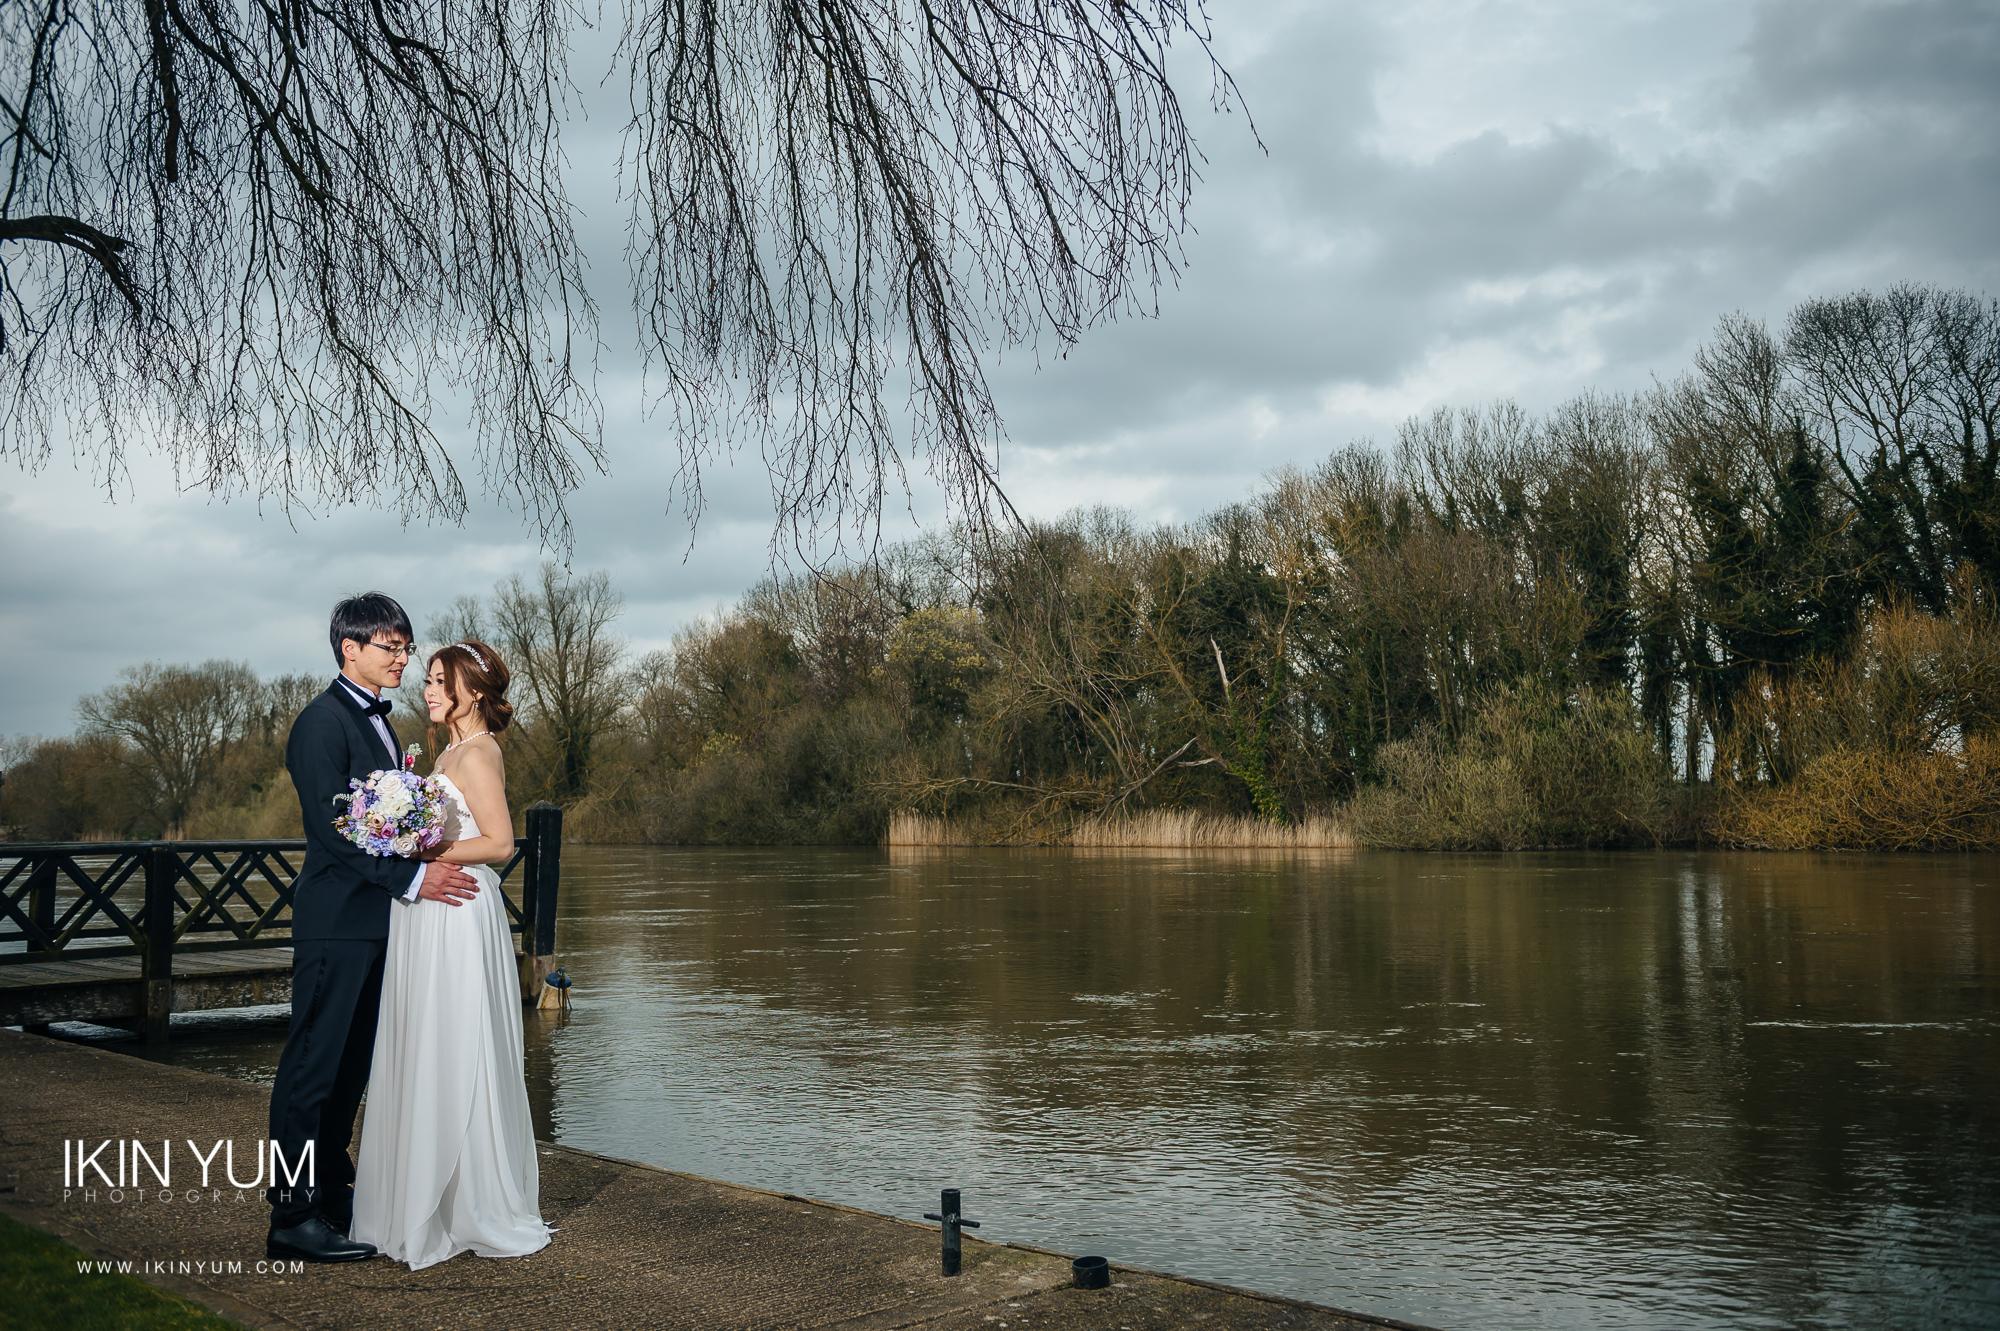 Oakley Court Wedding, Windsor - London wedding Photographer -  英国伦敦 婚礼 摄影